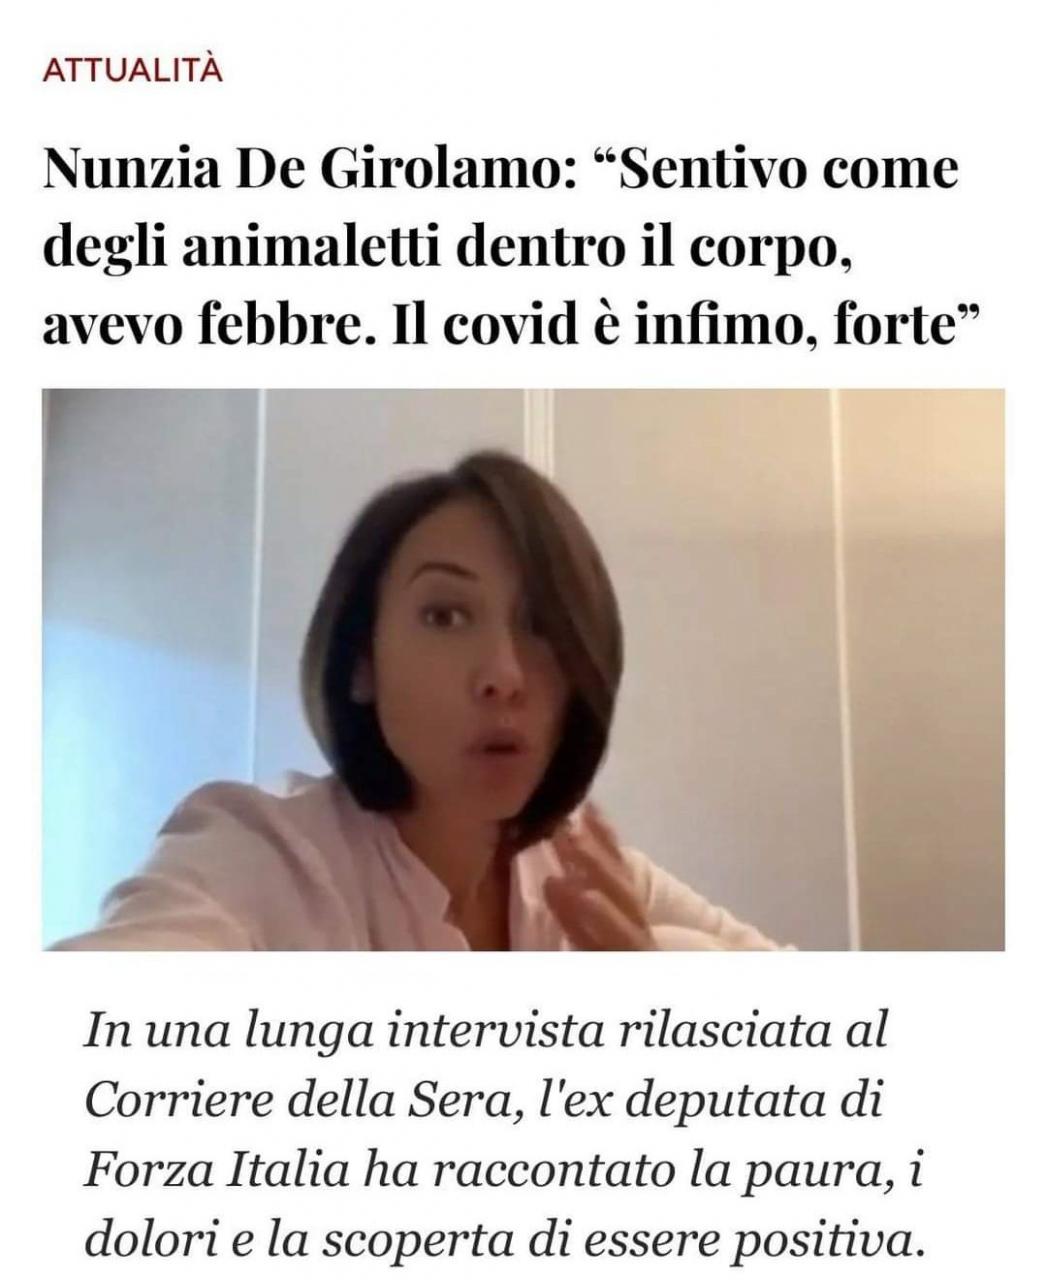 Nunzia De Girolamo